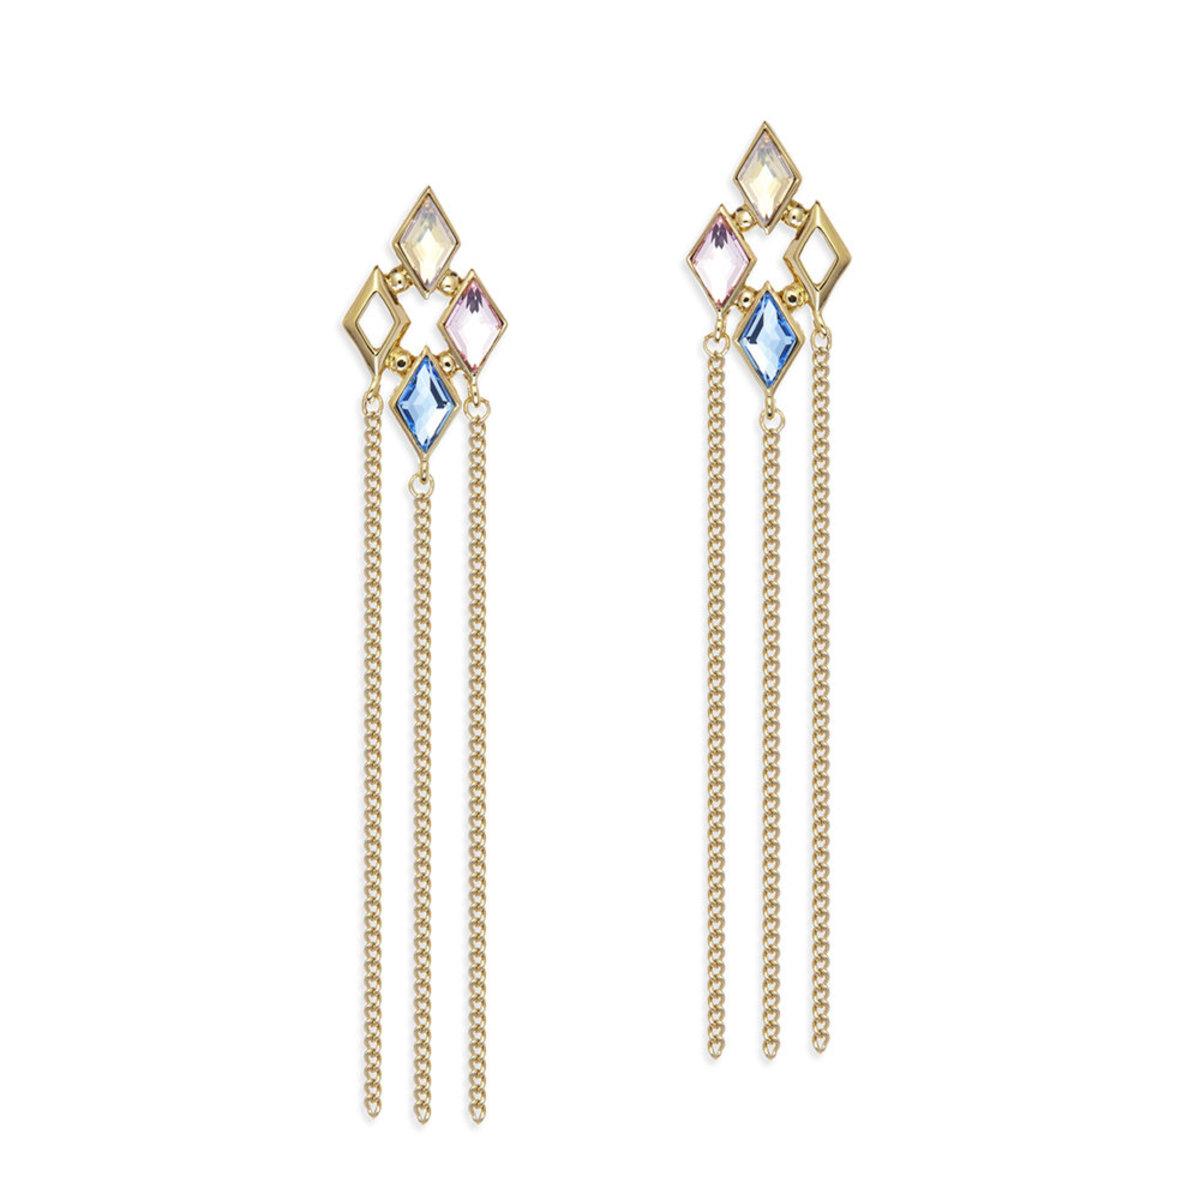 Glitter: gold plating, multi-coloured Swarovski crystal pierced earrings